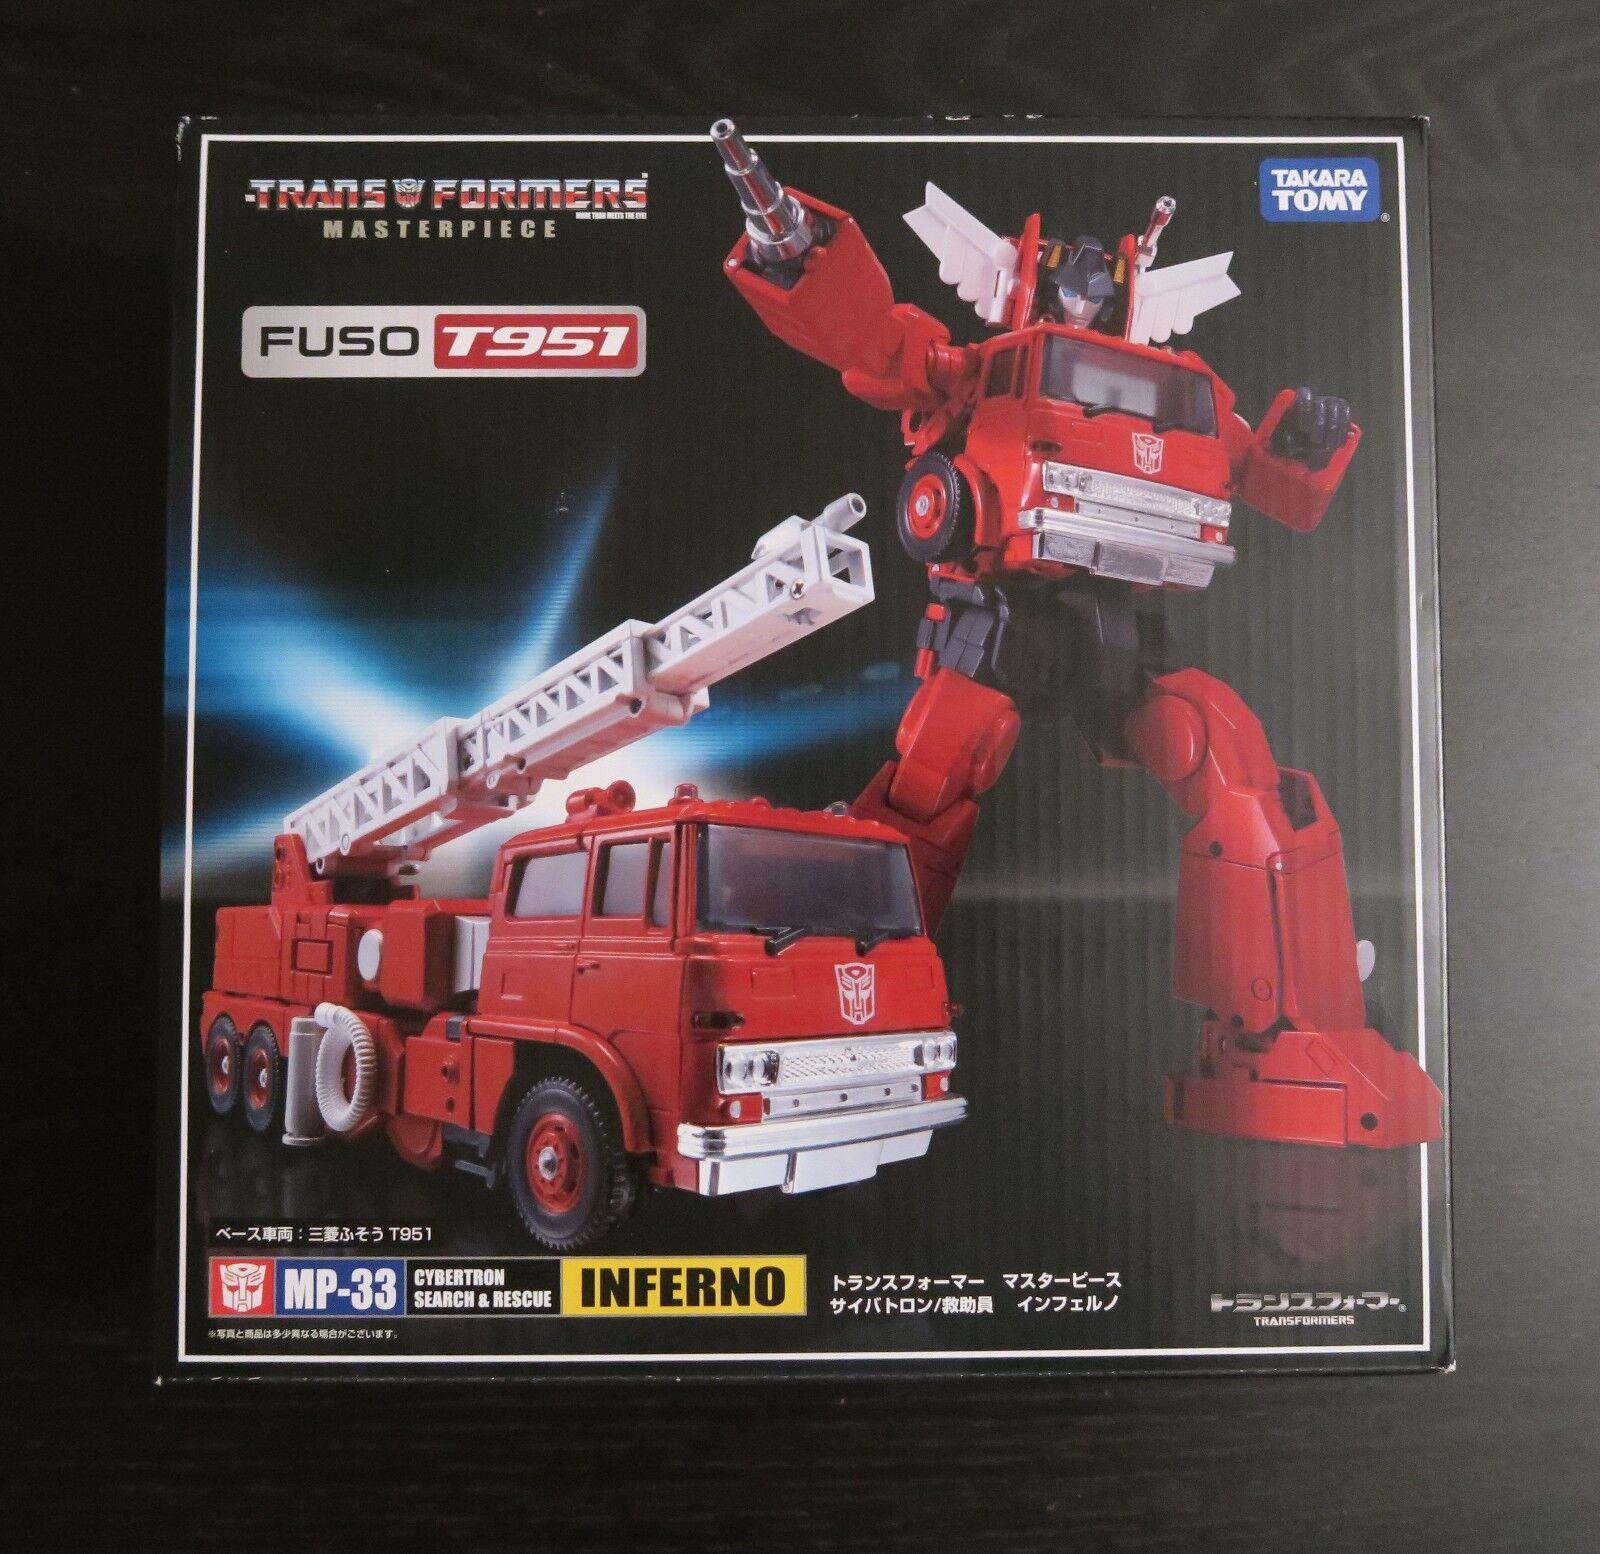 Transformers Takara Masterpiece MP33 MP33 MP33 Inferno e105d9